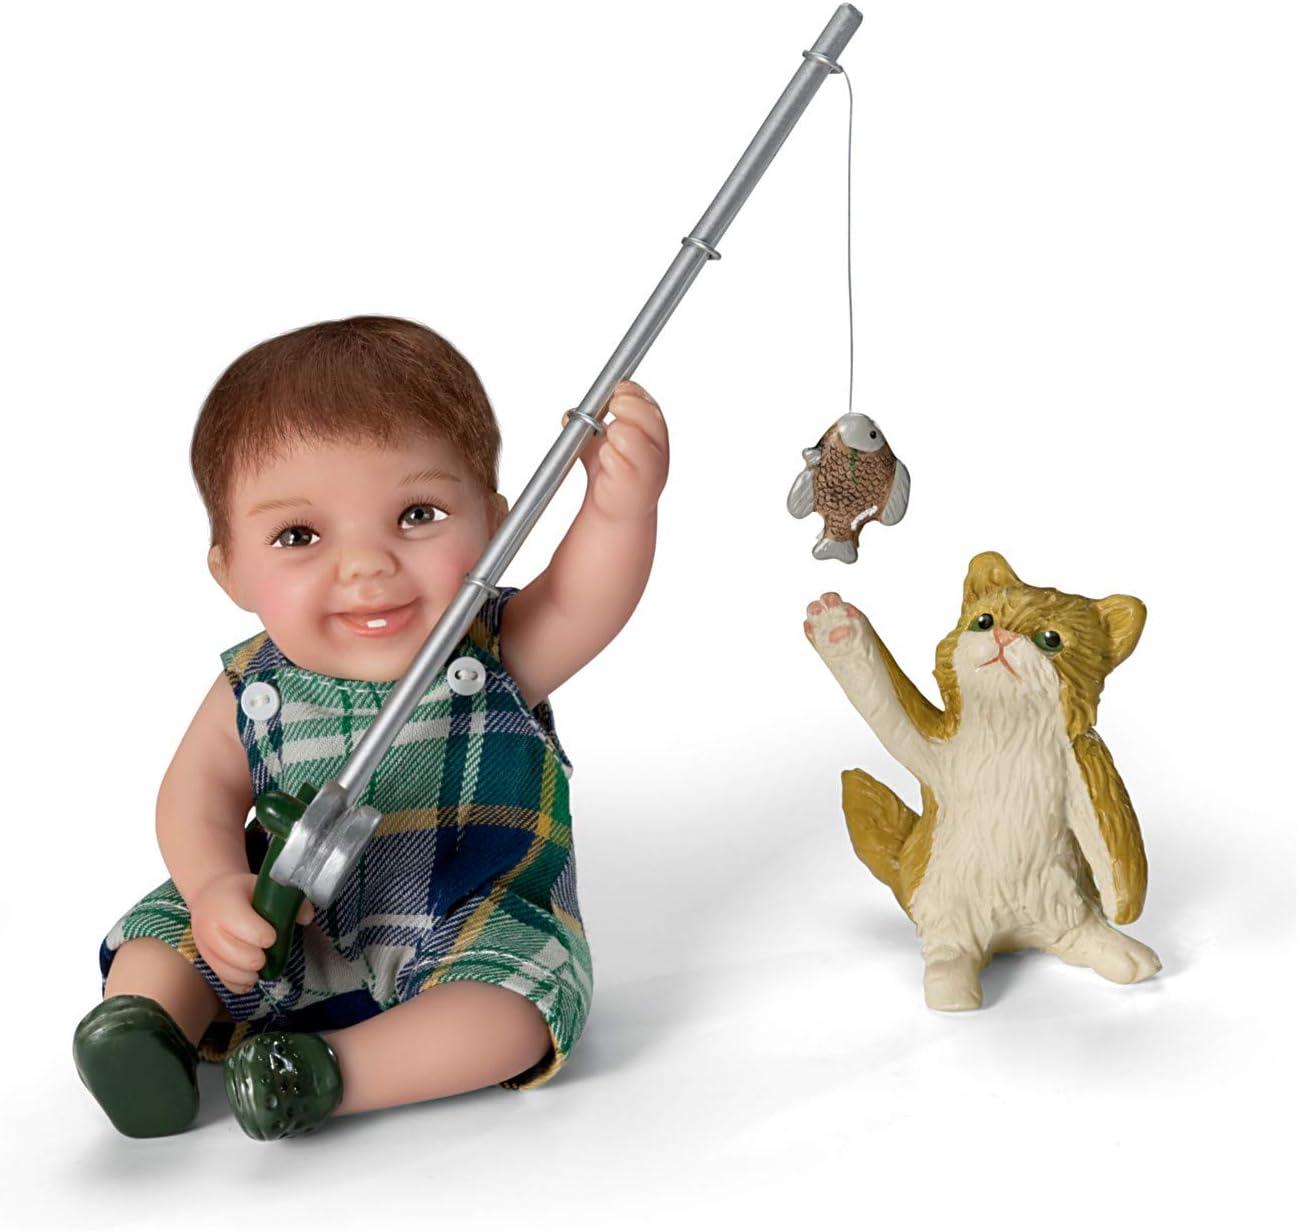 The Ashton - 5 National products popular Drake Galleries Fisherman Boy Cute Dol Toddler Reel